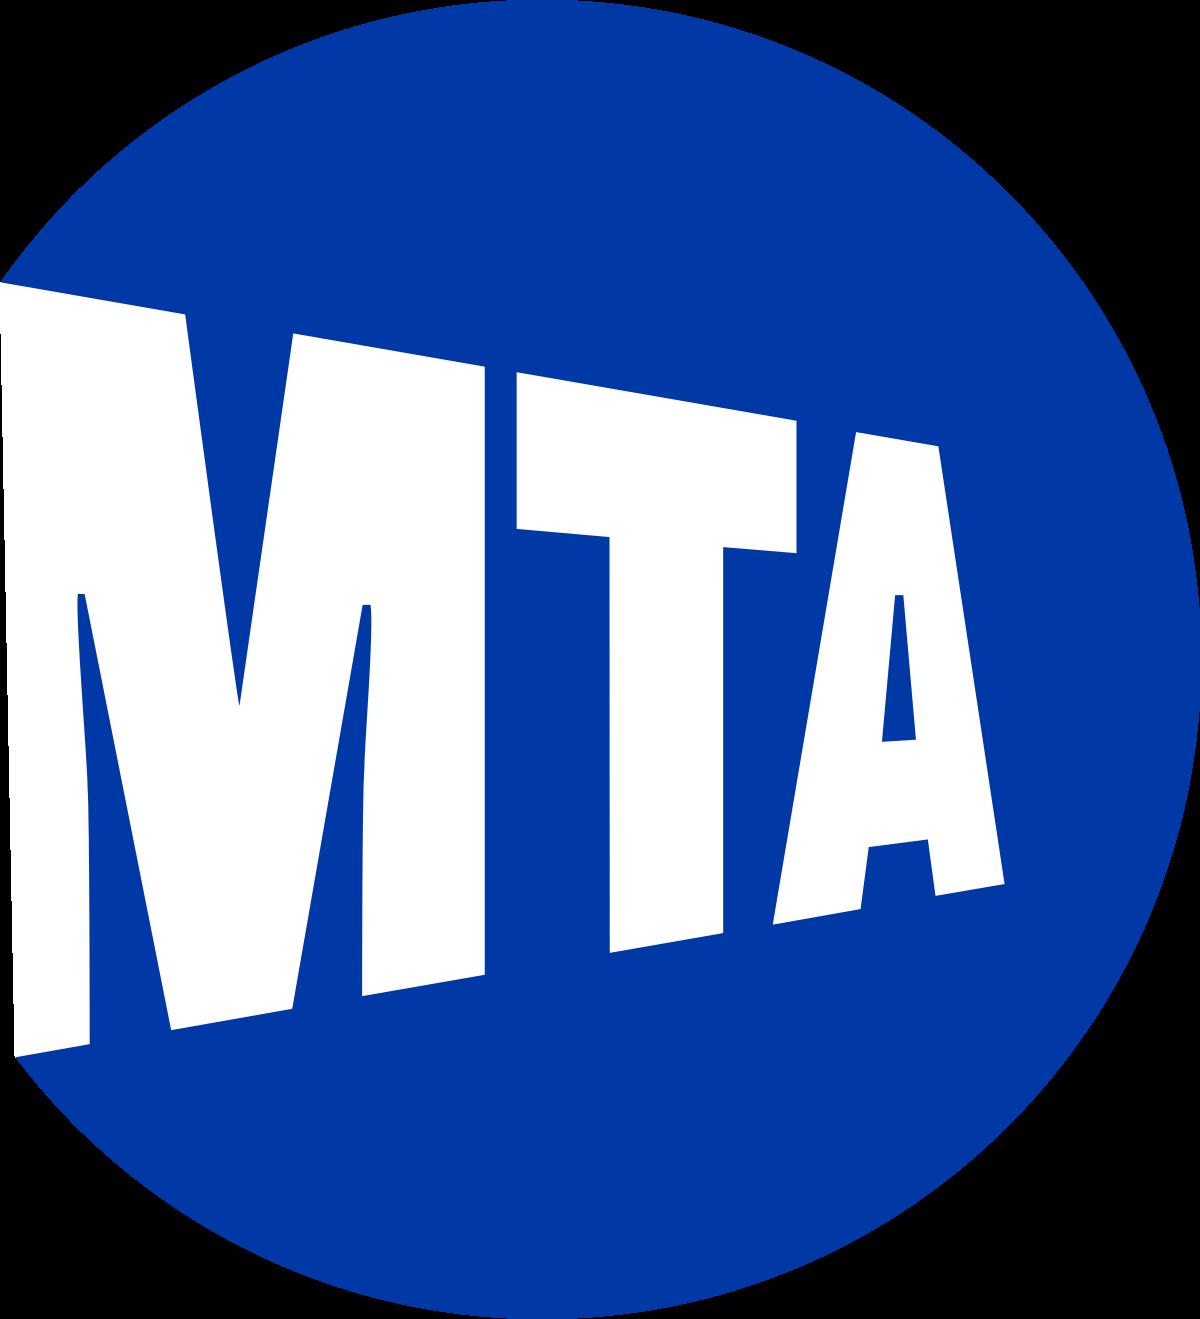 New York City Transit (MTA)